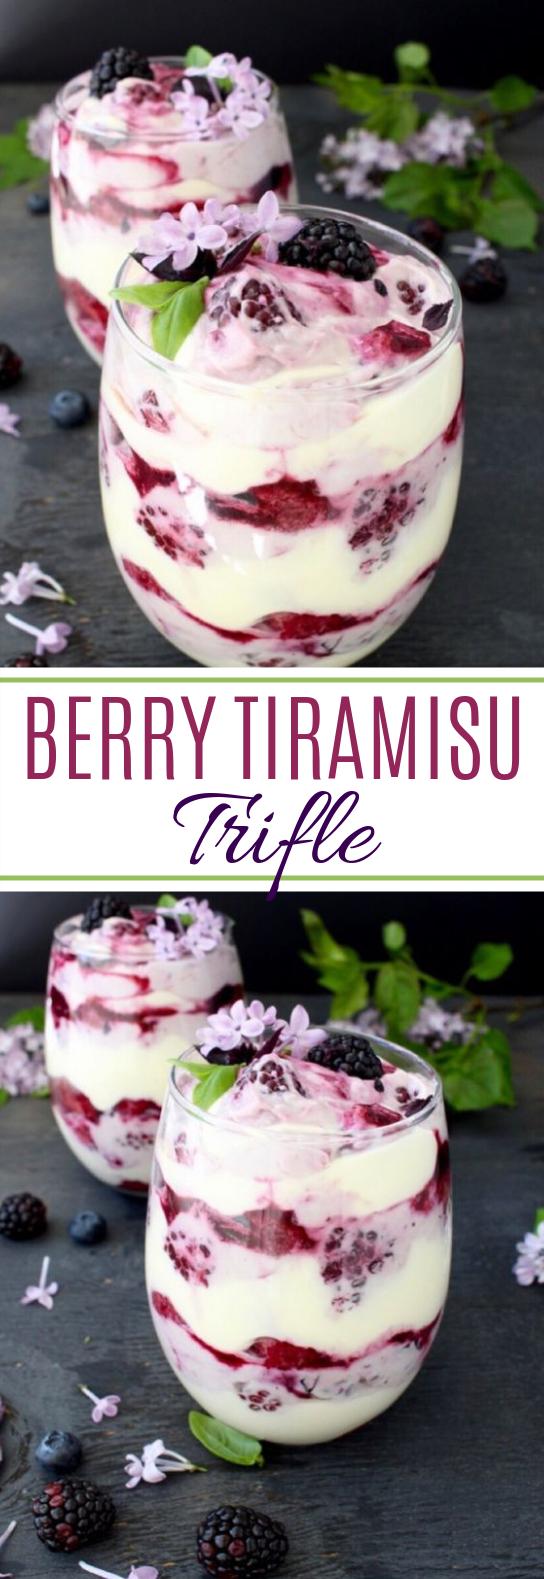 Berry Tiramisu Trifle #desserts #tiramisu